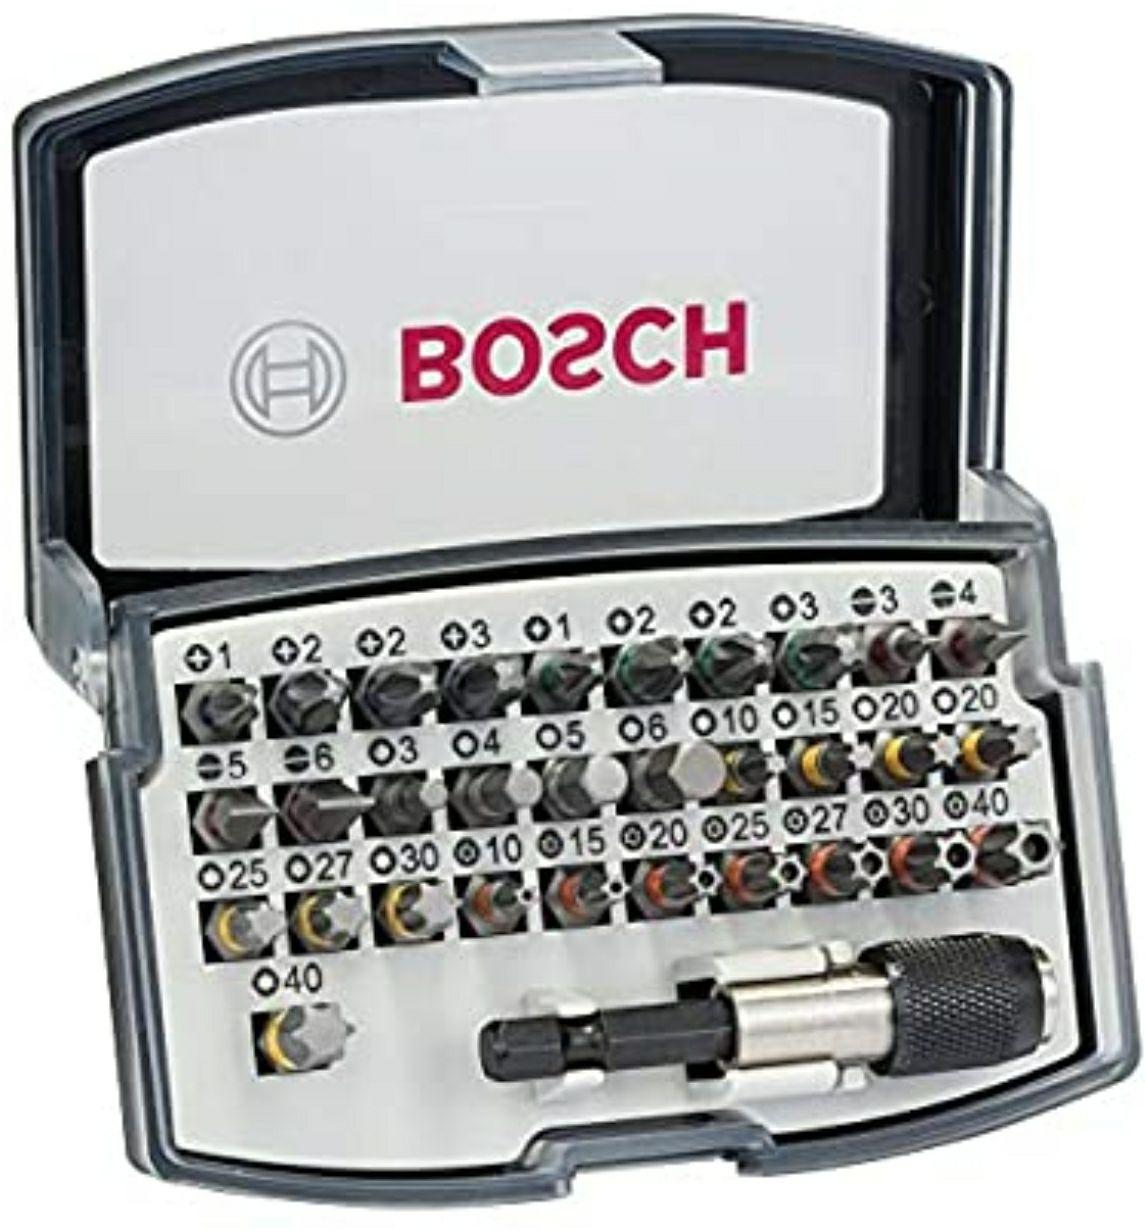 [Amazon.nl] Bosch Professional 32-delige schroefbitset